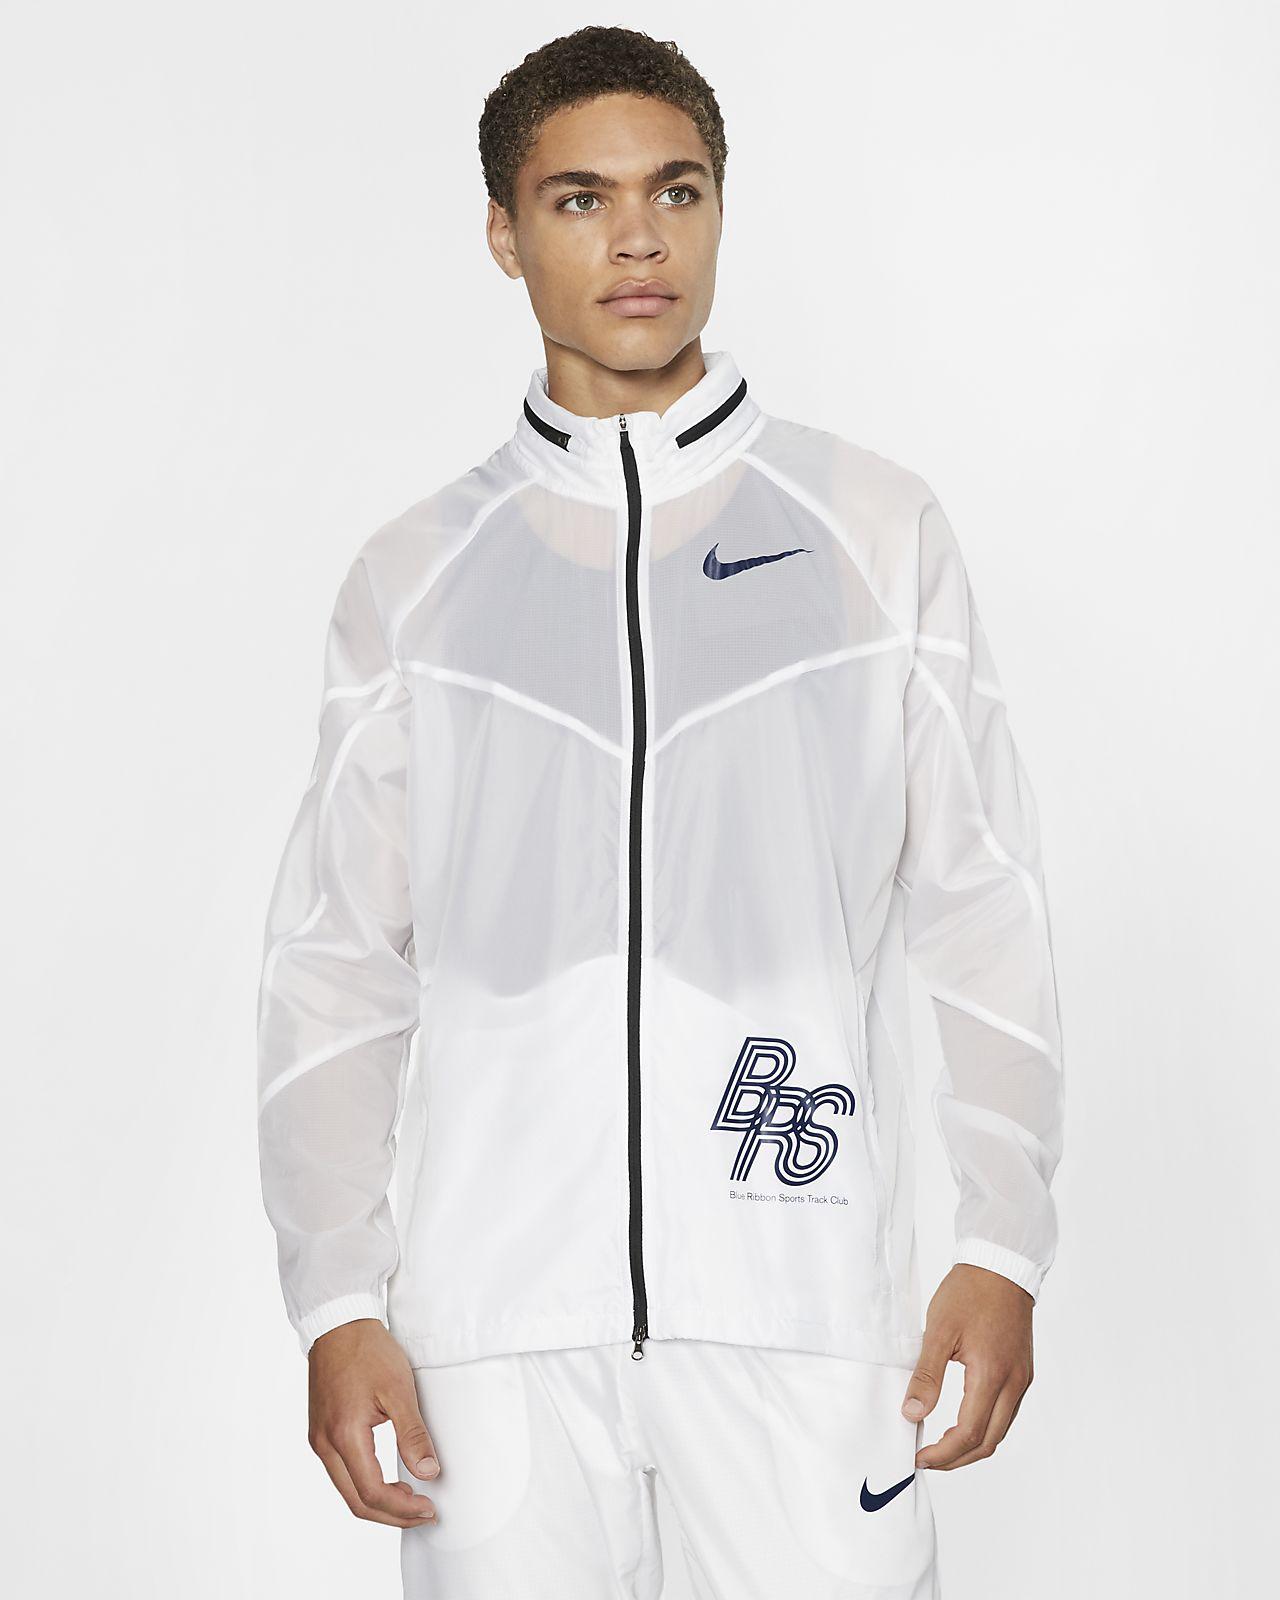 Nike BRS Running Jacket